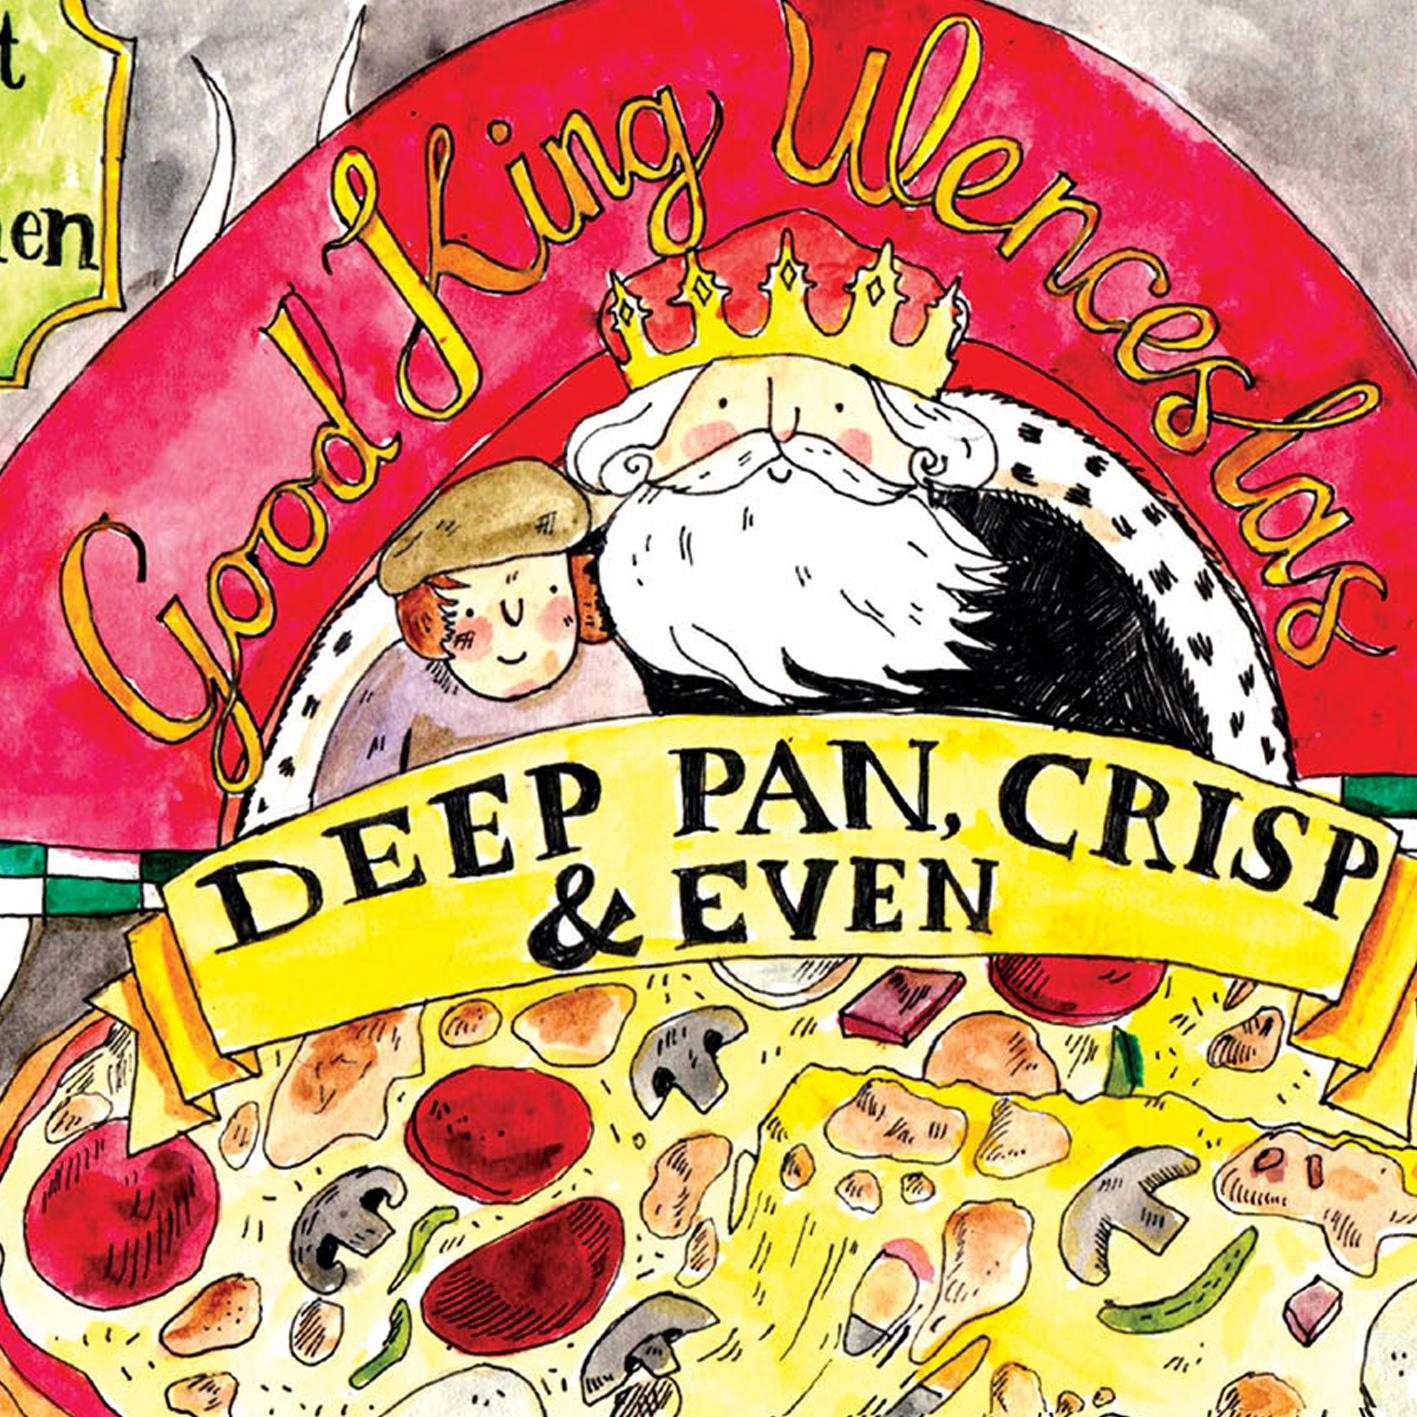 Deep-Pan_Pizza-Christmas-card-with-Christmas-carol-puns_CH09_CU